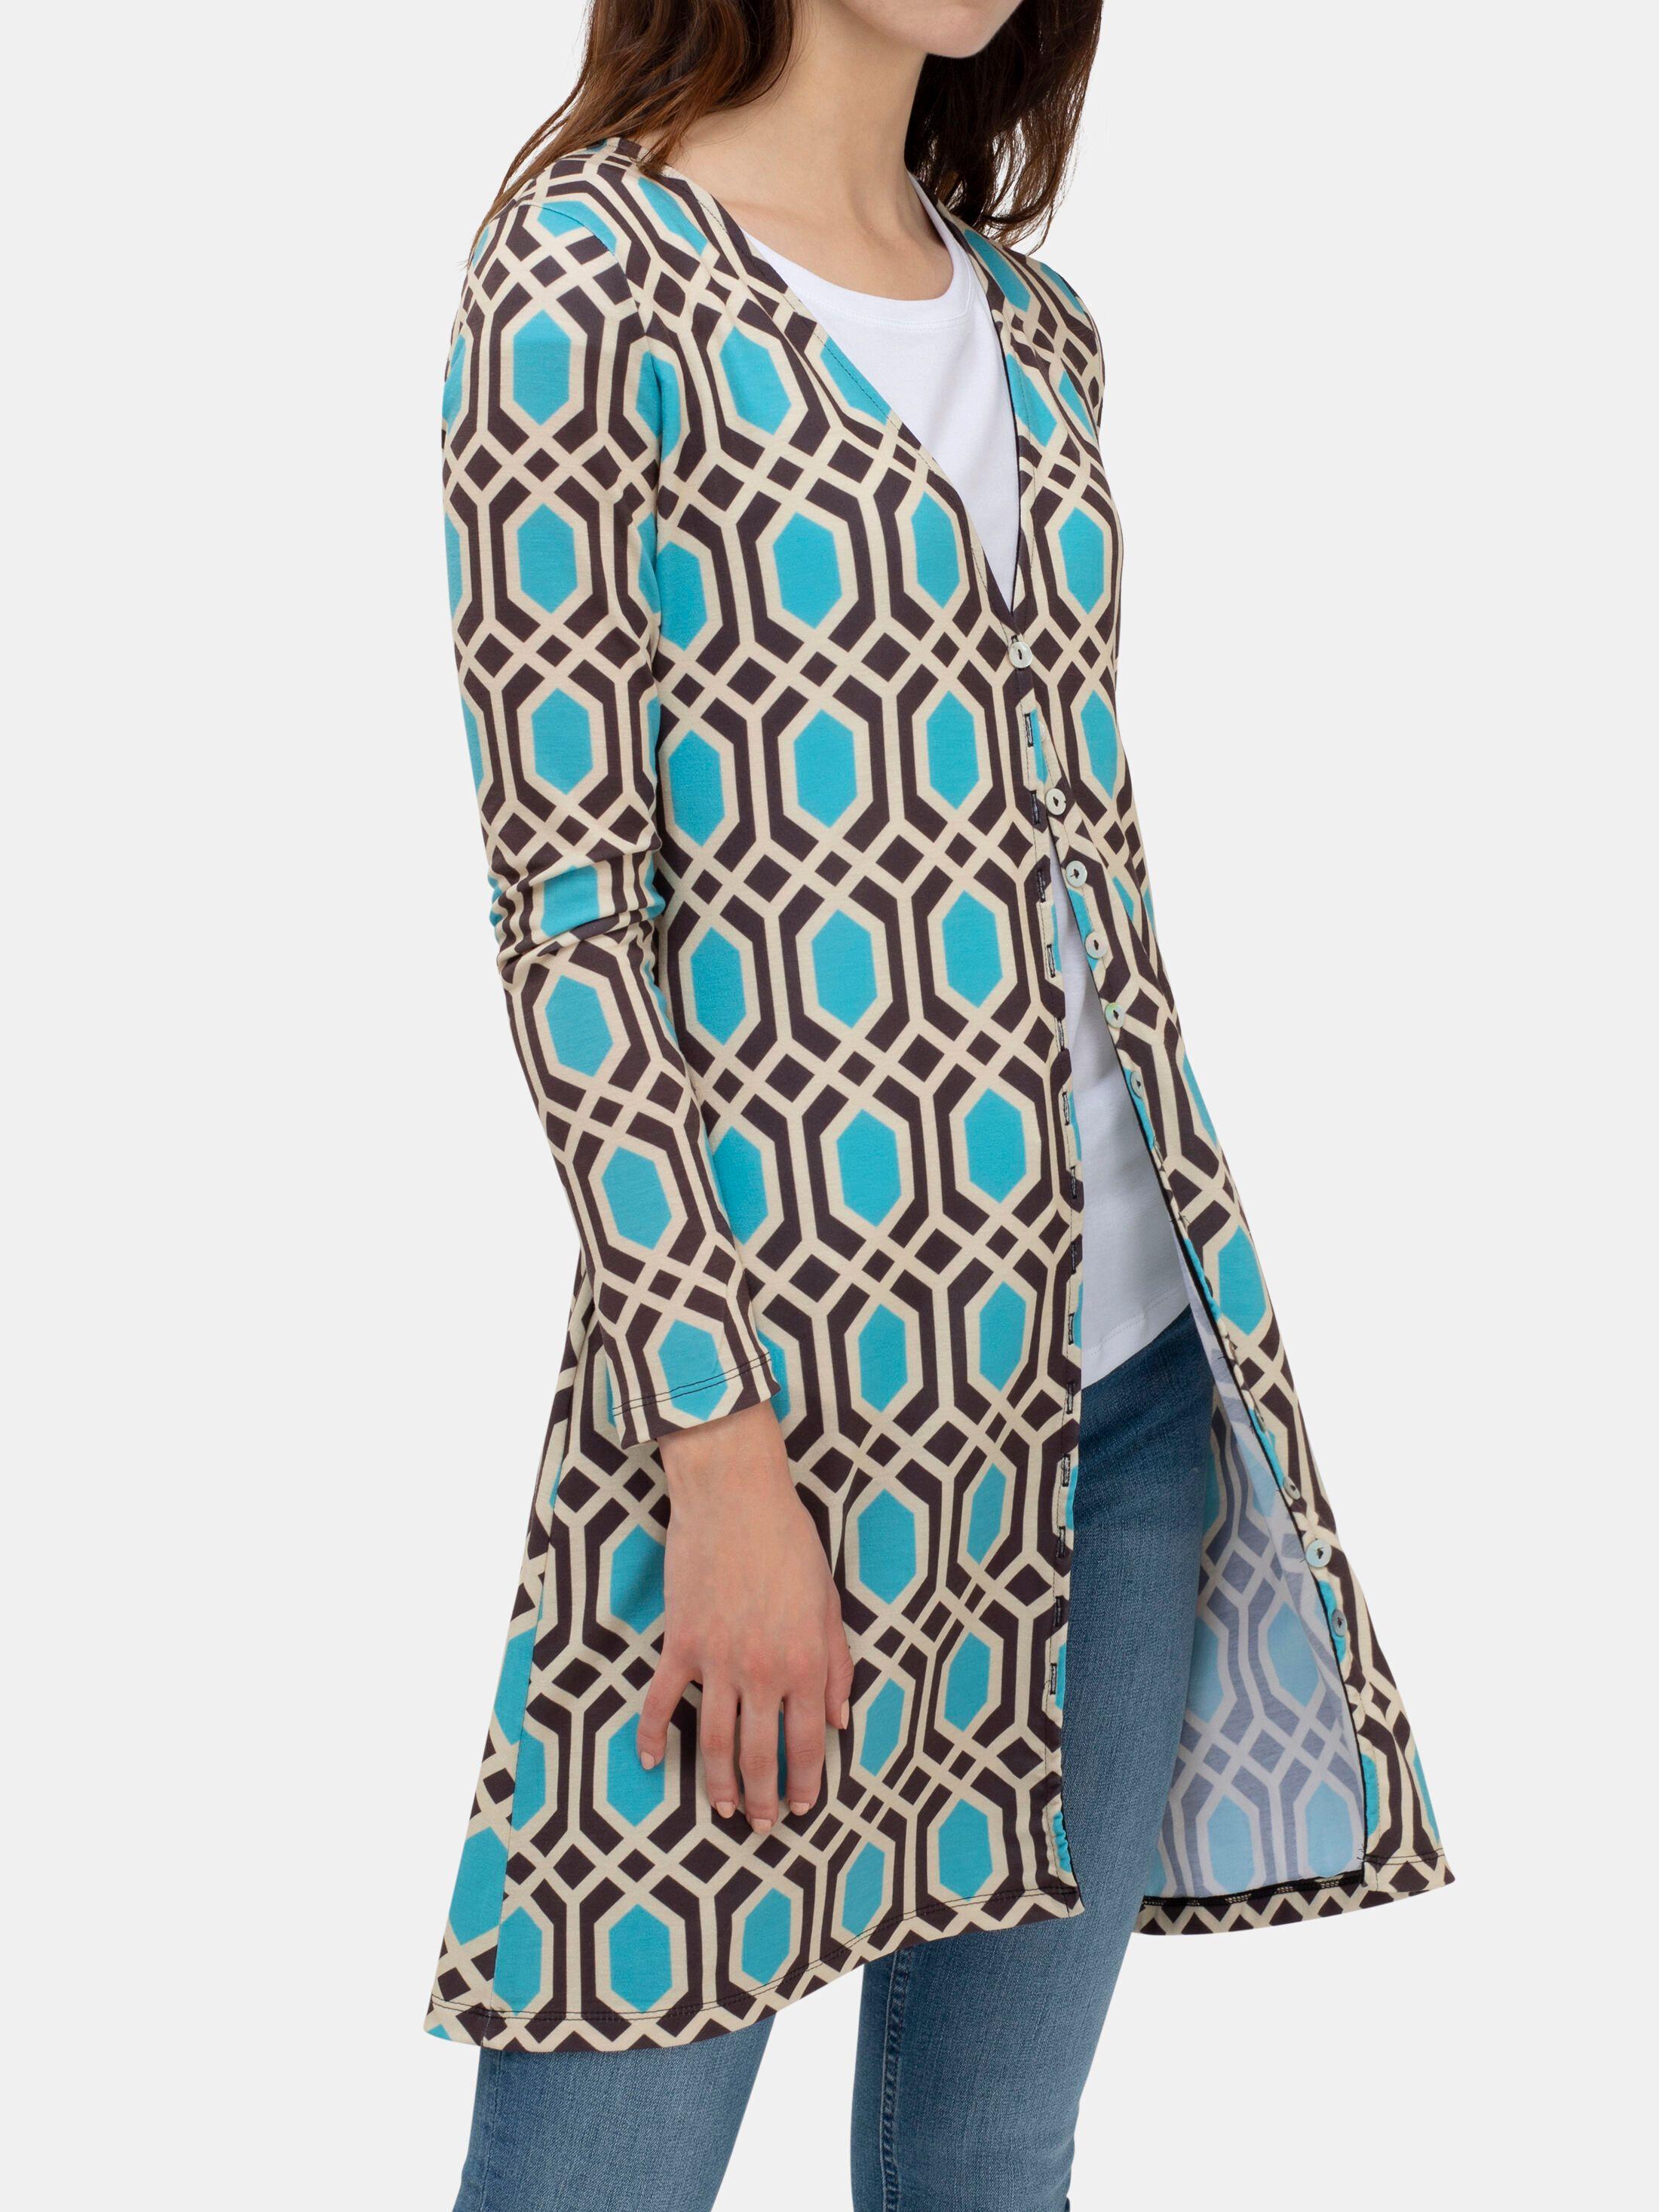 custom women's printed cardigans